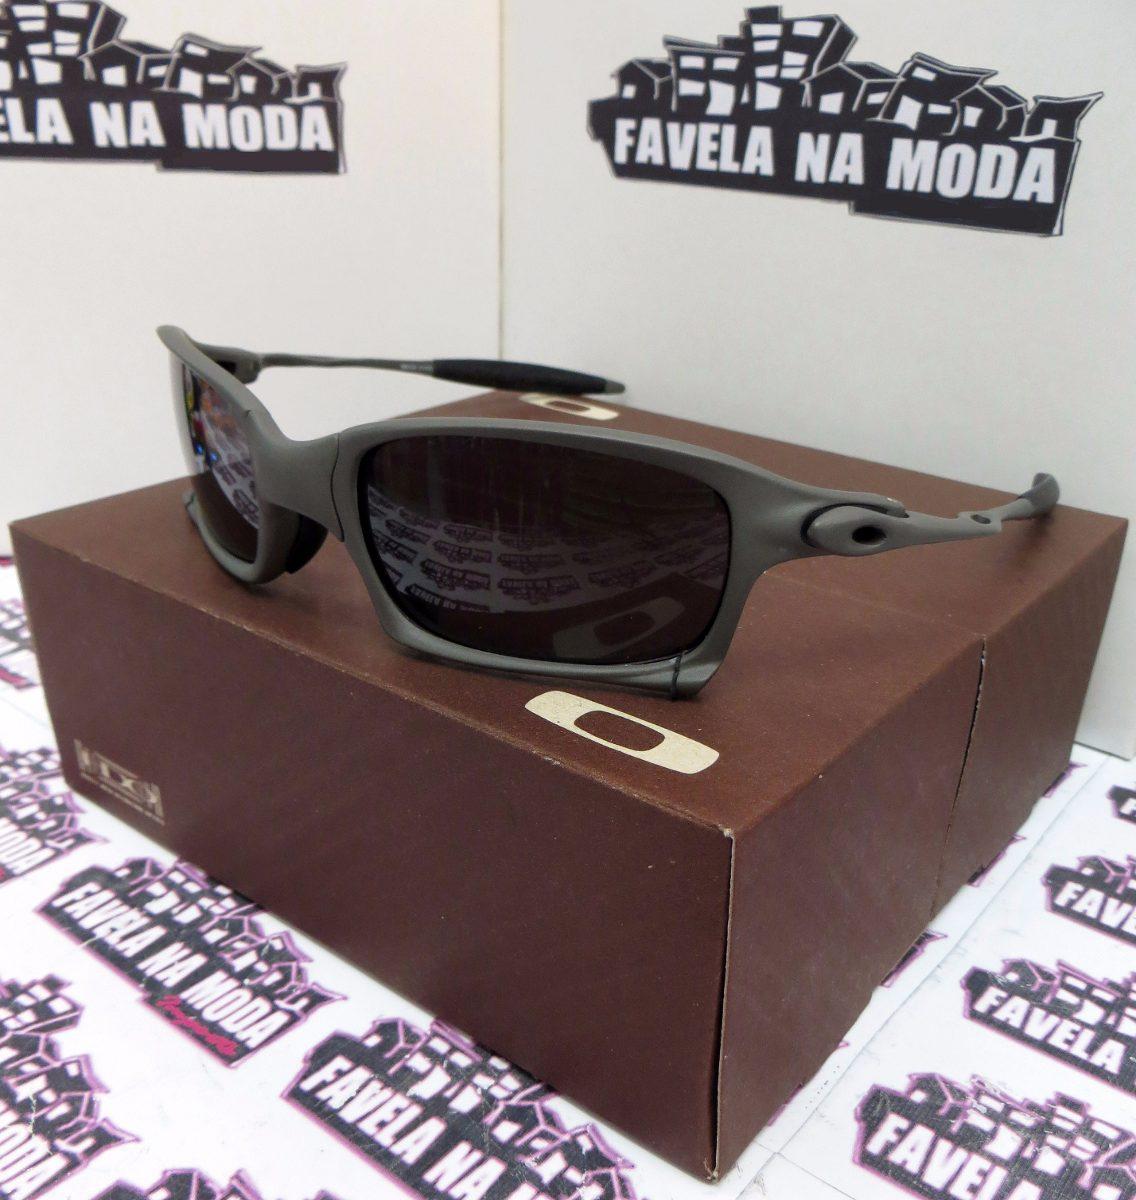 Óculos Oakley X-squared +caixa+saquinho+par De Lentes+brinde - 1f4433f189